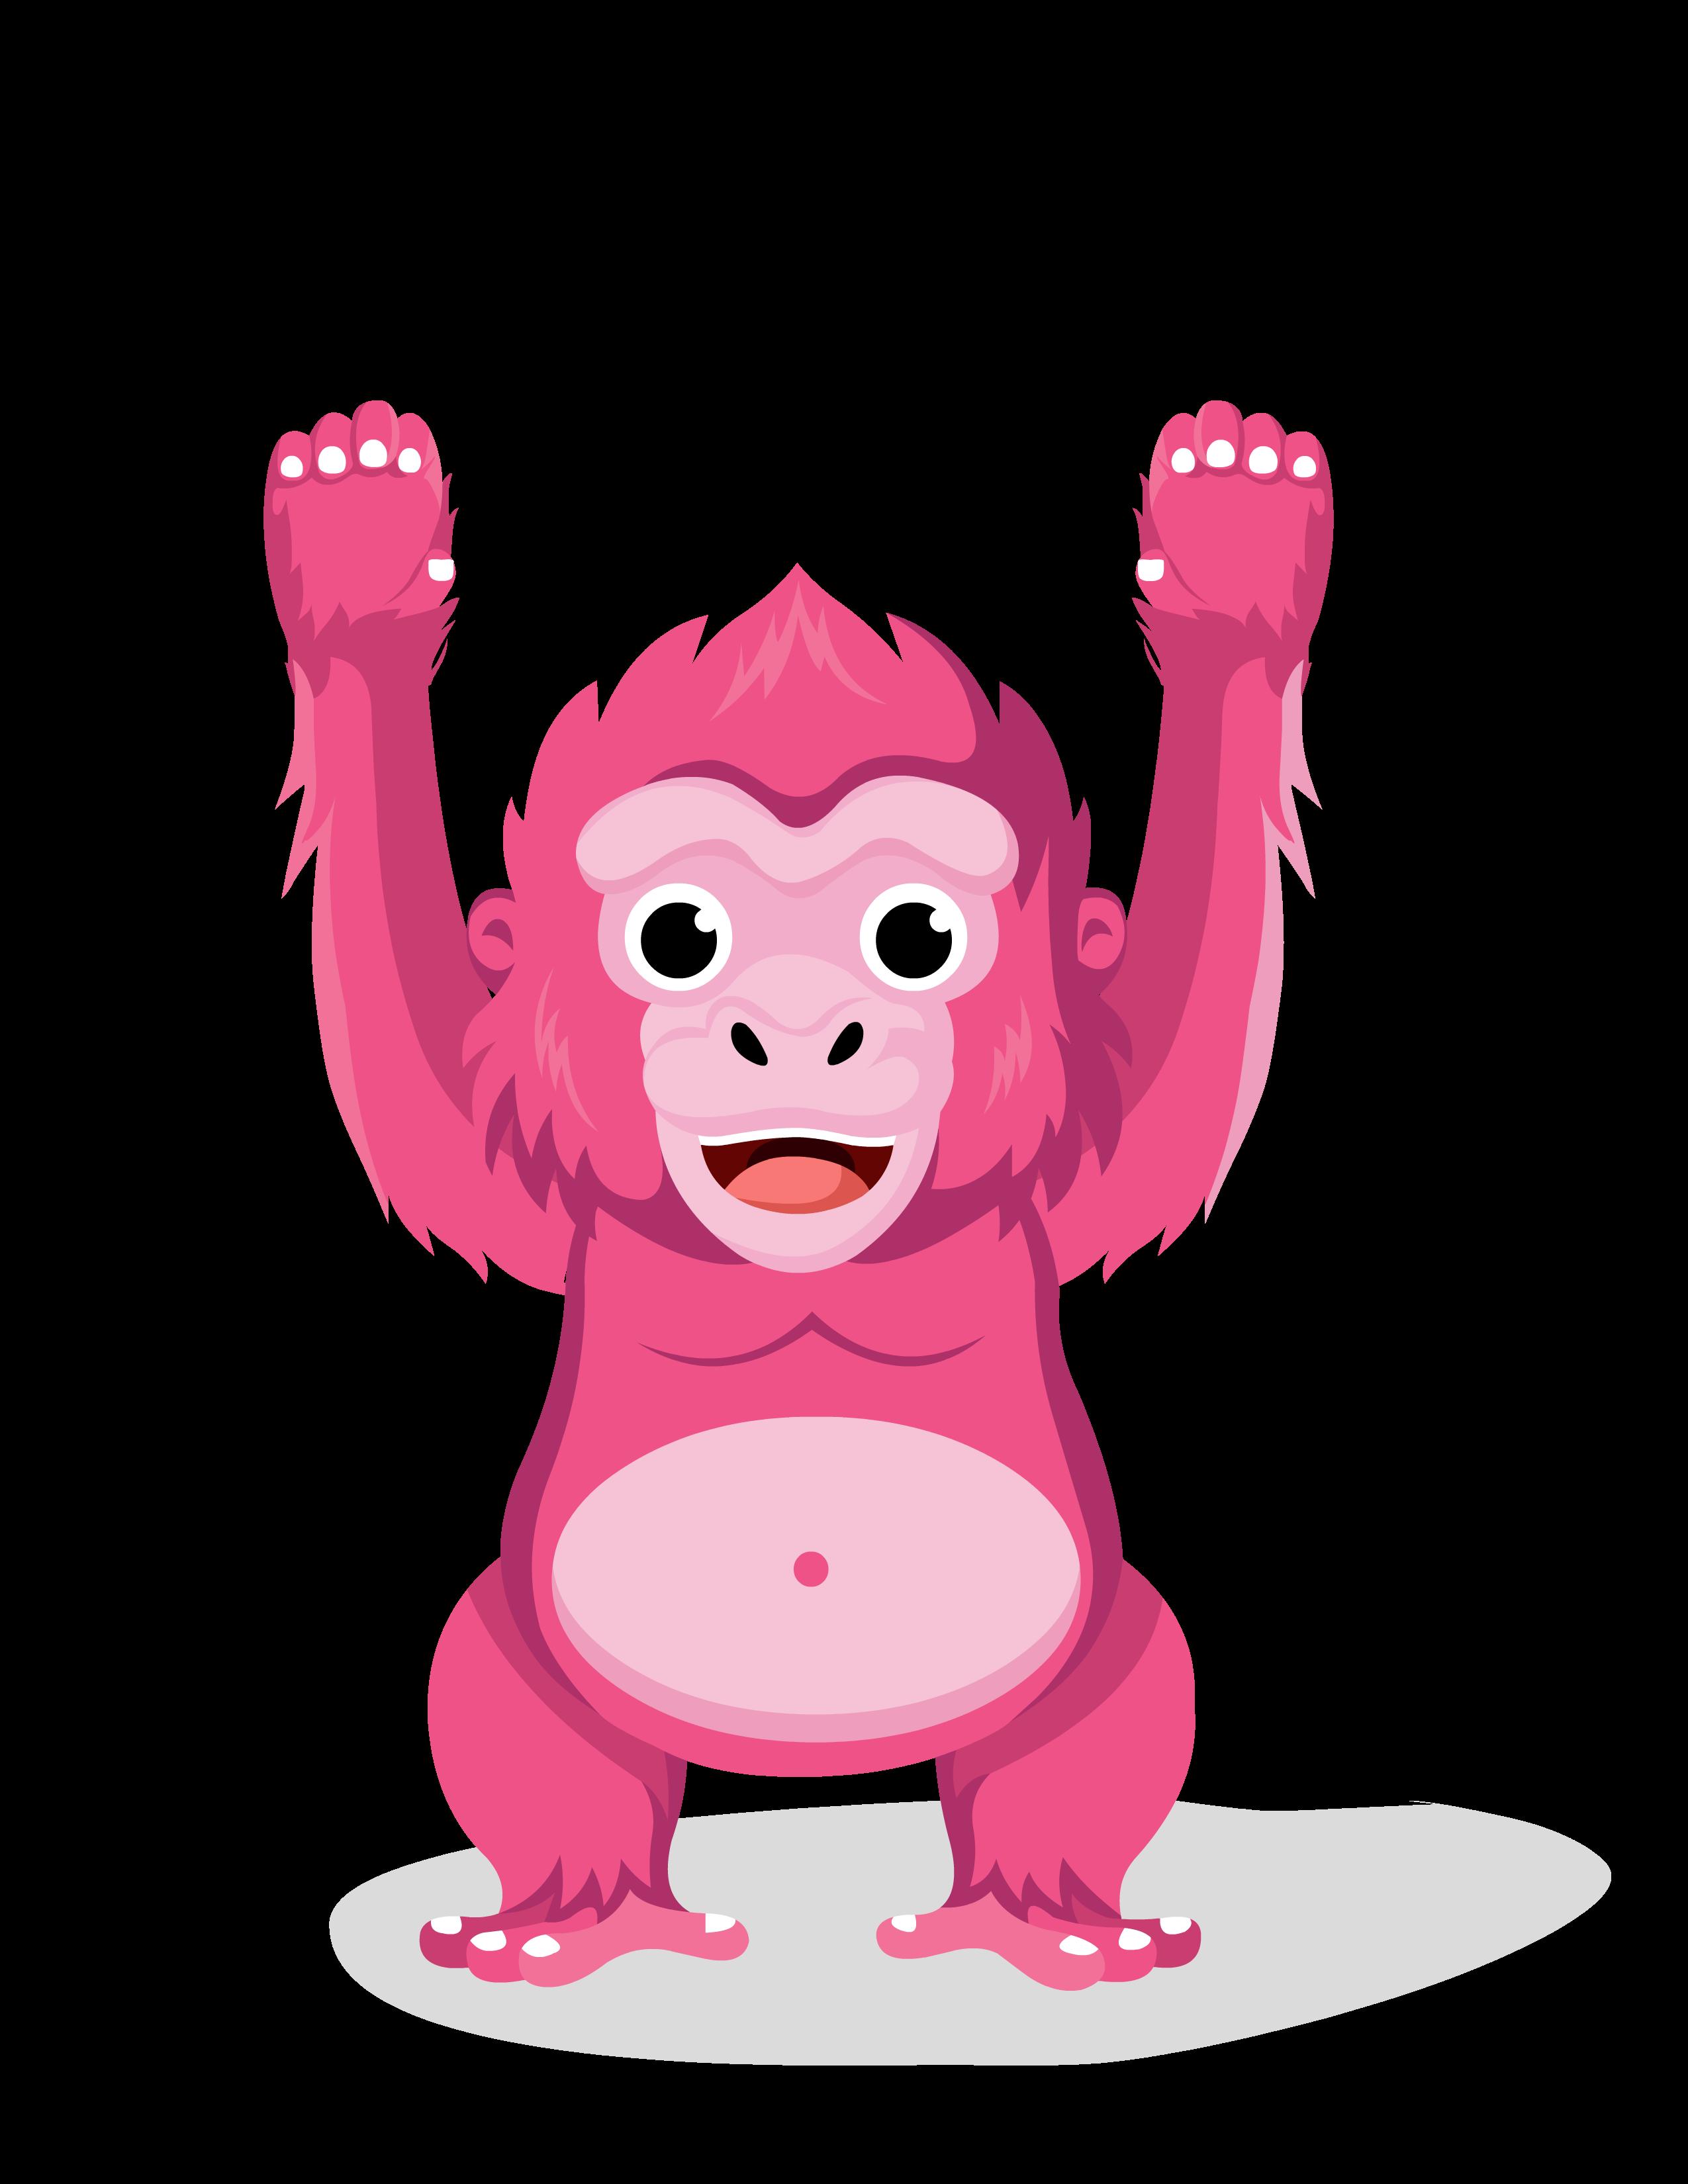 hands up pink gorilla